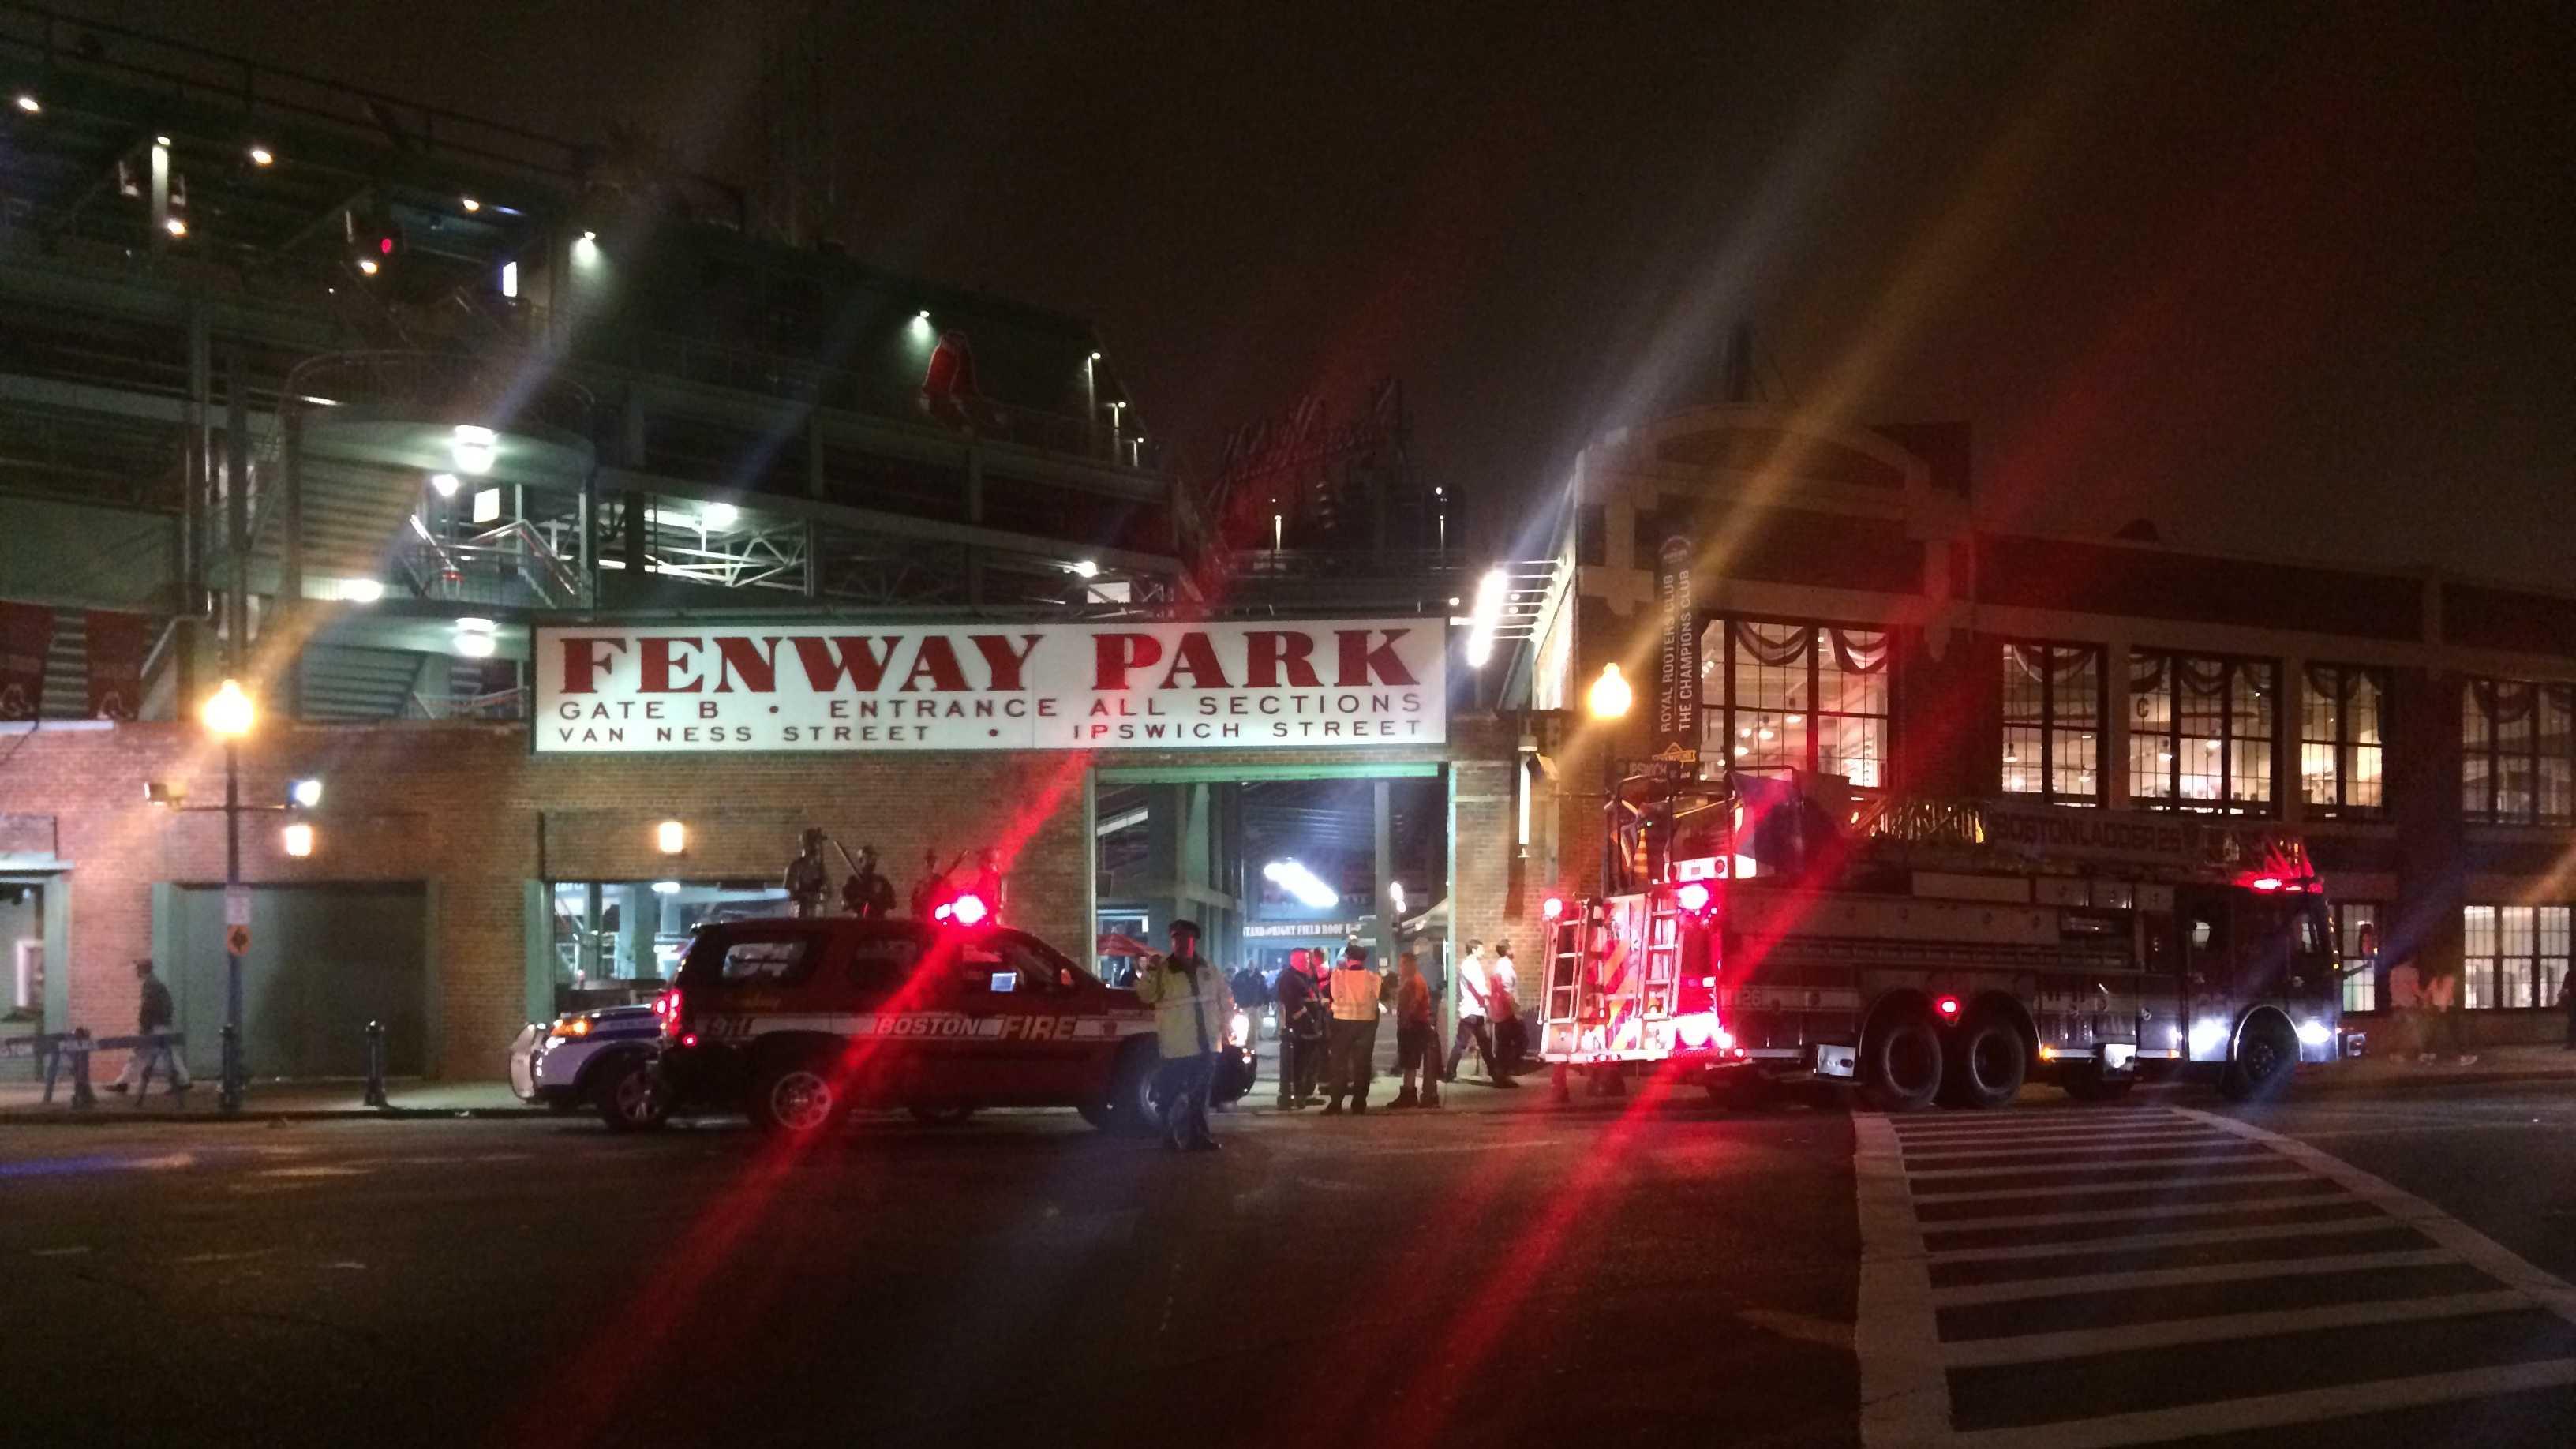 Fenway Park Elevator Accident